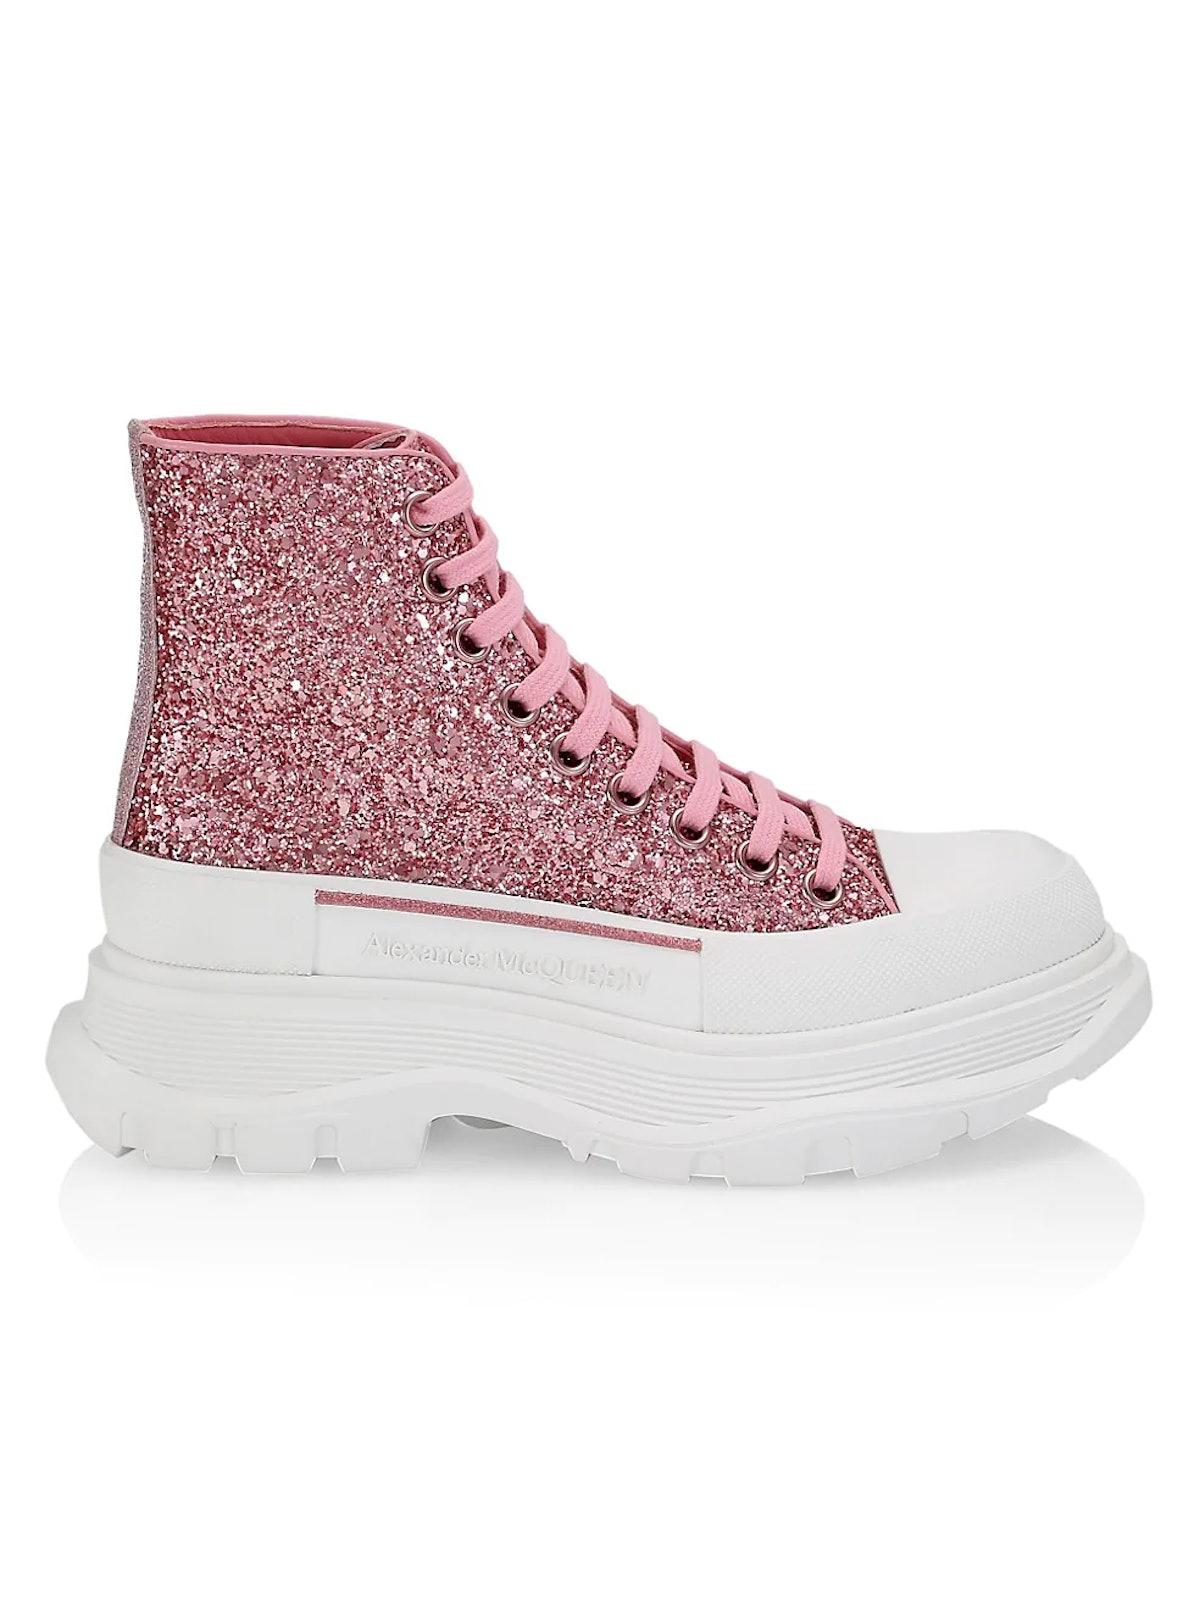 ALEXANDER MCQUEEN Tread Slick Glitter High-Top Fashion Sneakers